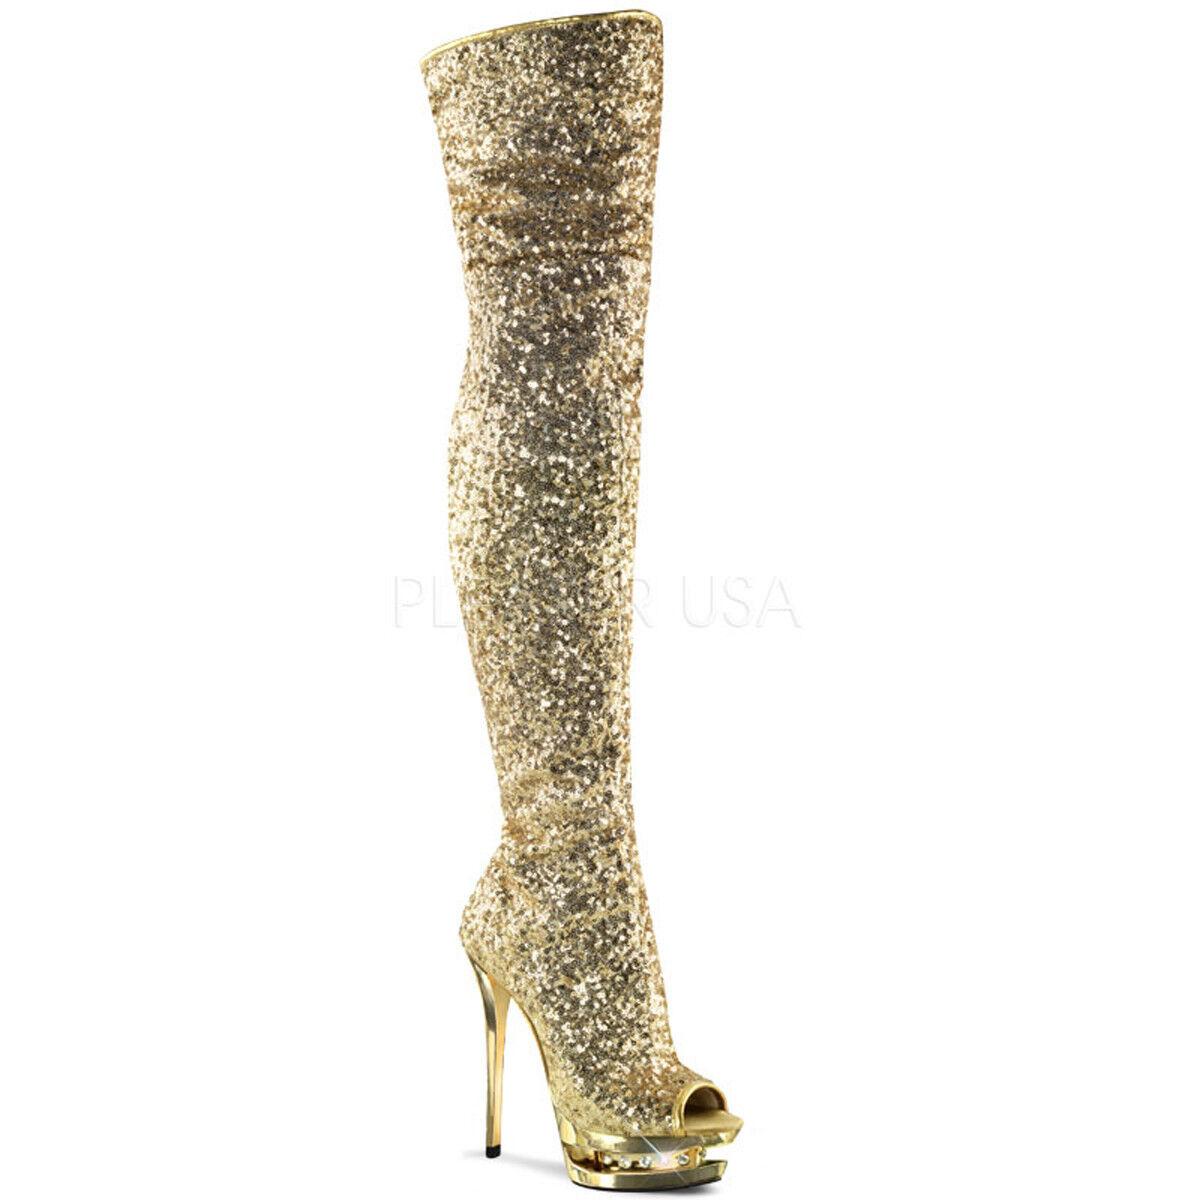 Pleaser Stivali BLONDIE-R-3011 Gold Sequins/Gold Chrome Thigh High Stivali Pleaser Sexy Platforms 5e399d